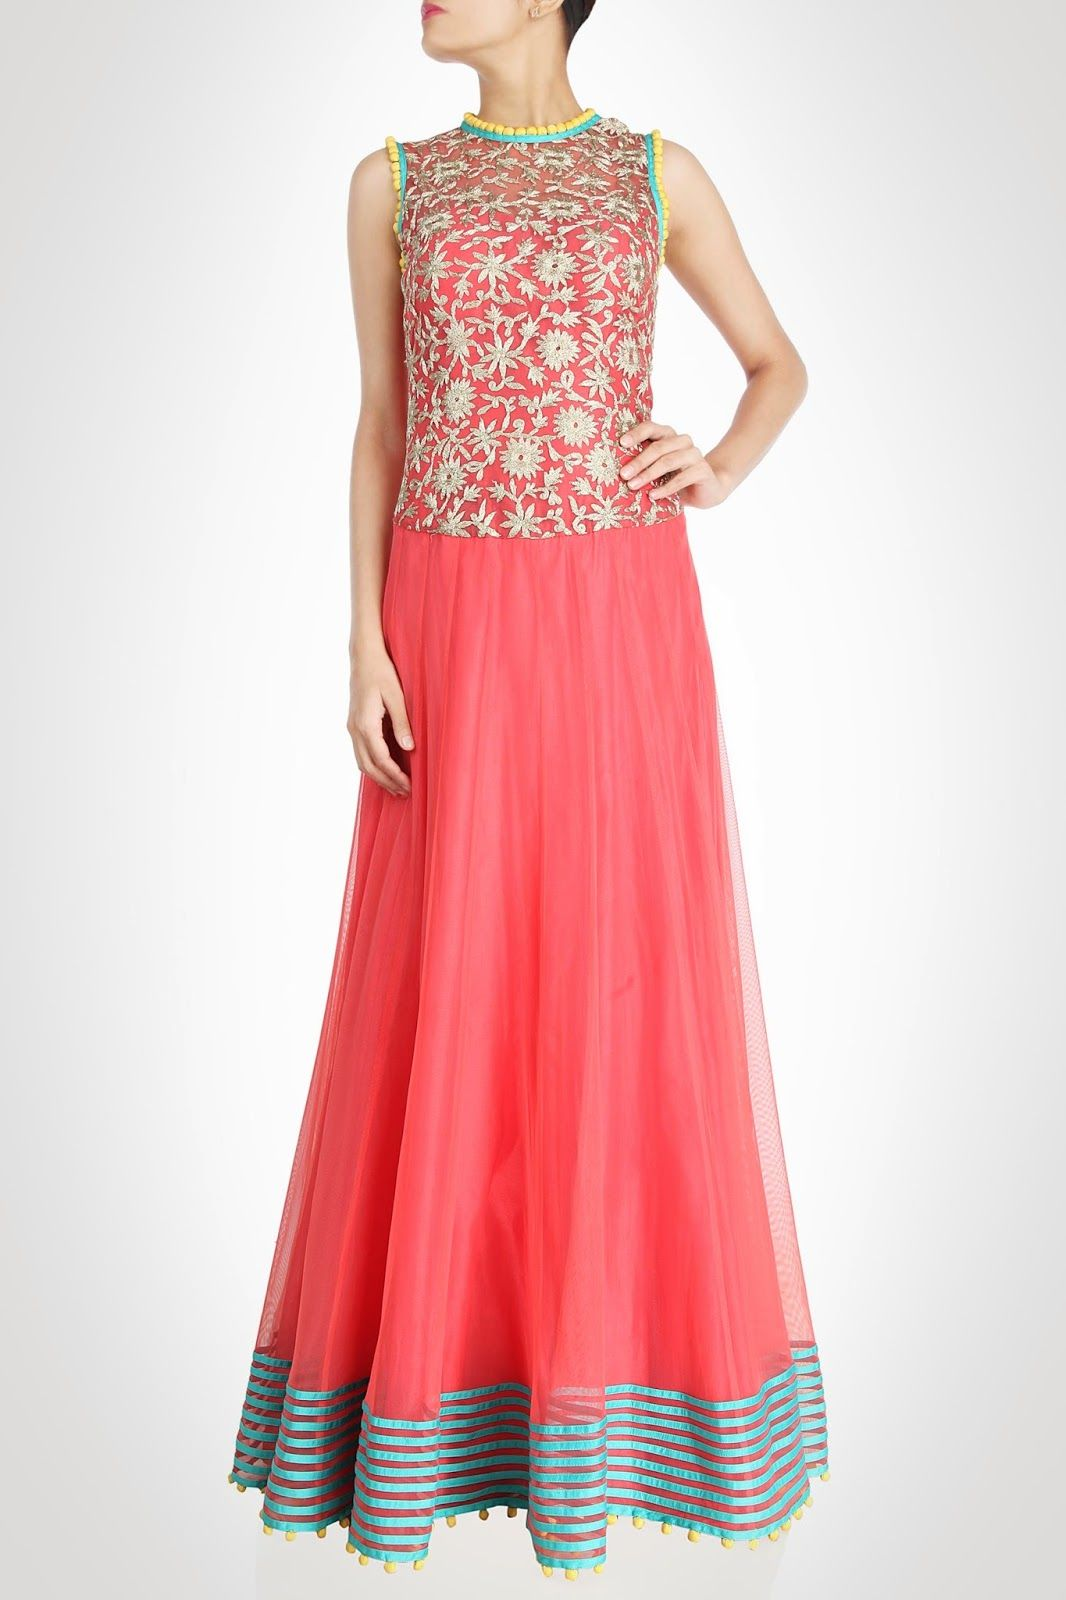 8165729a6beb Maxi Dress Indian Style